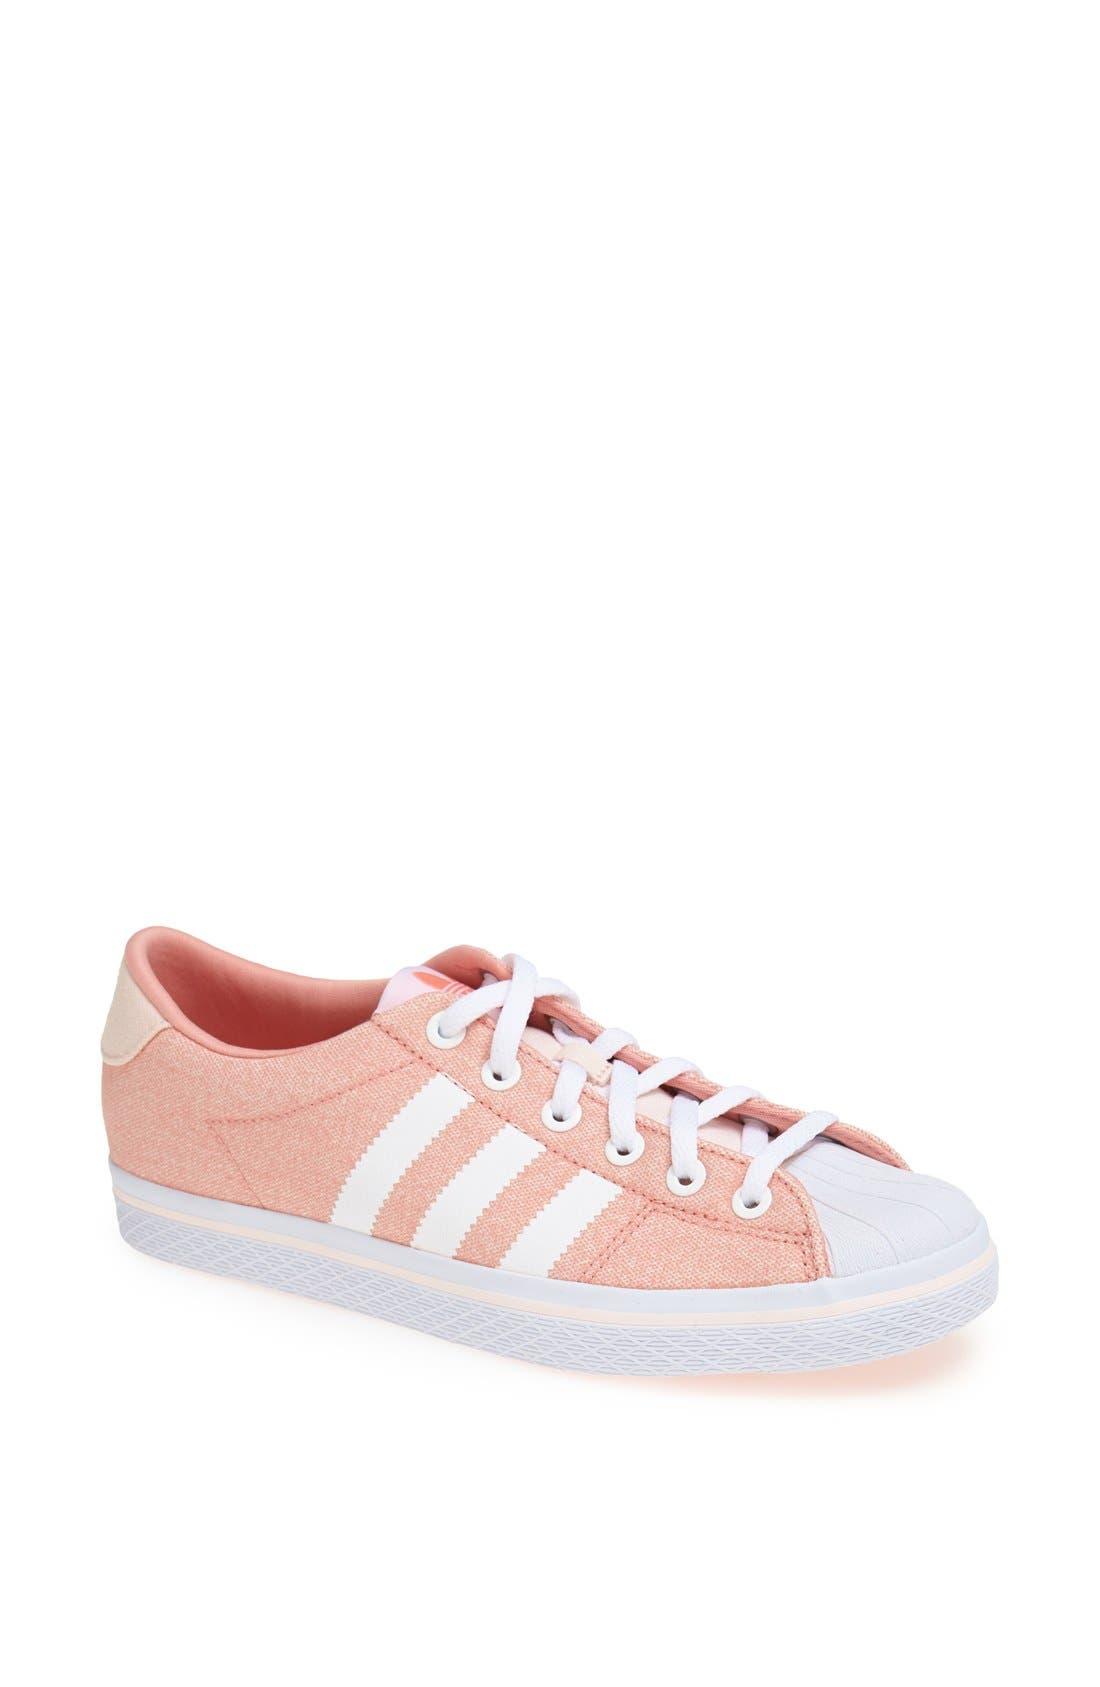 Main Image - adidas 'Vulc Star Lo' Sneaker (Women)